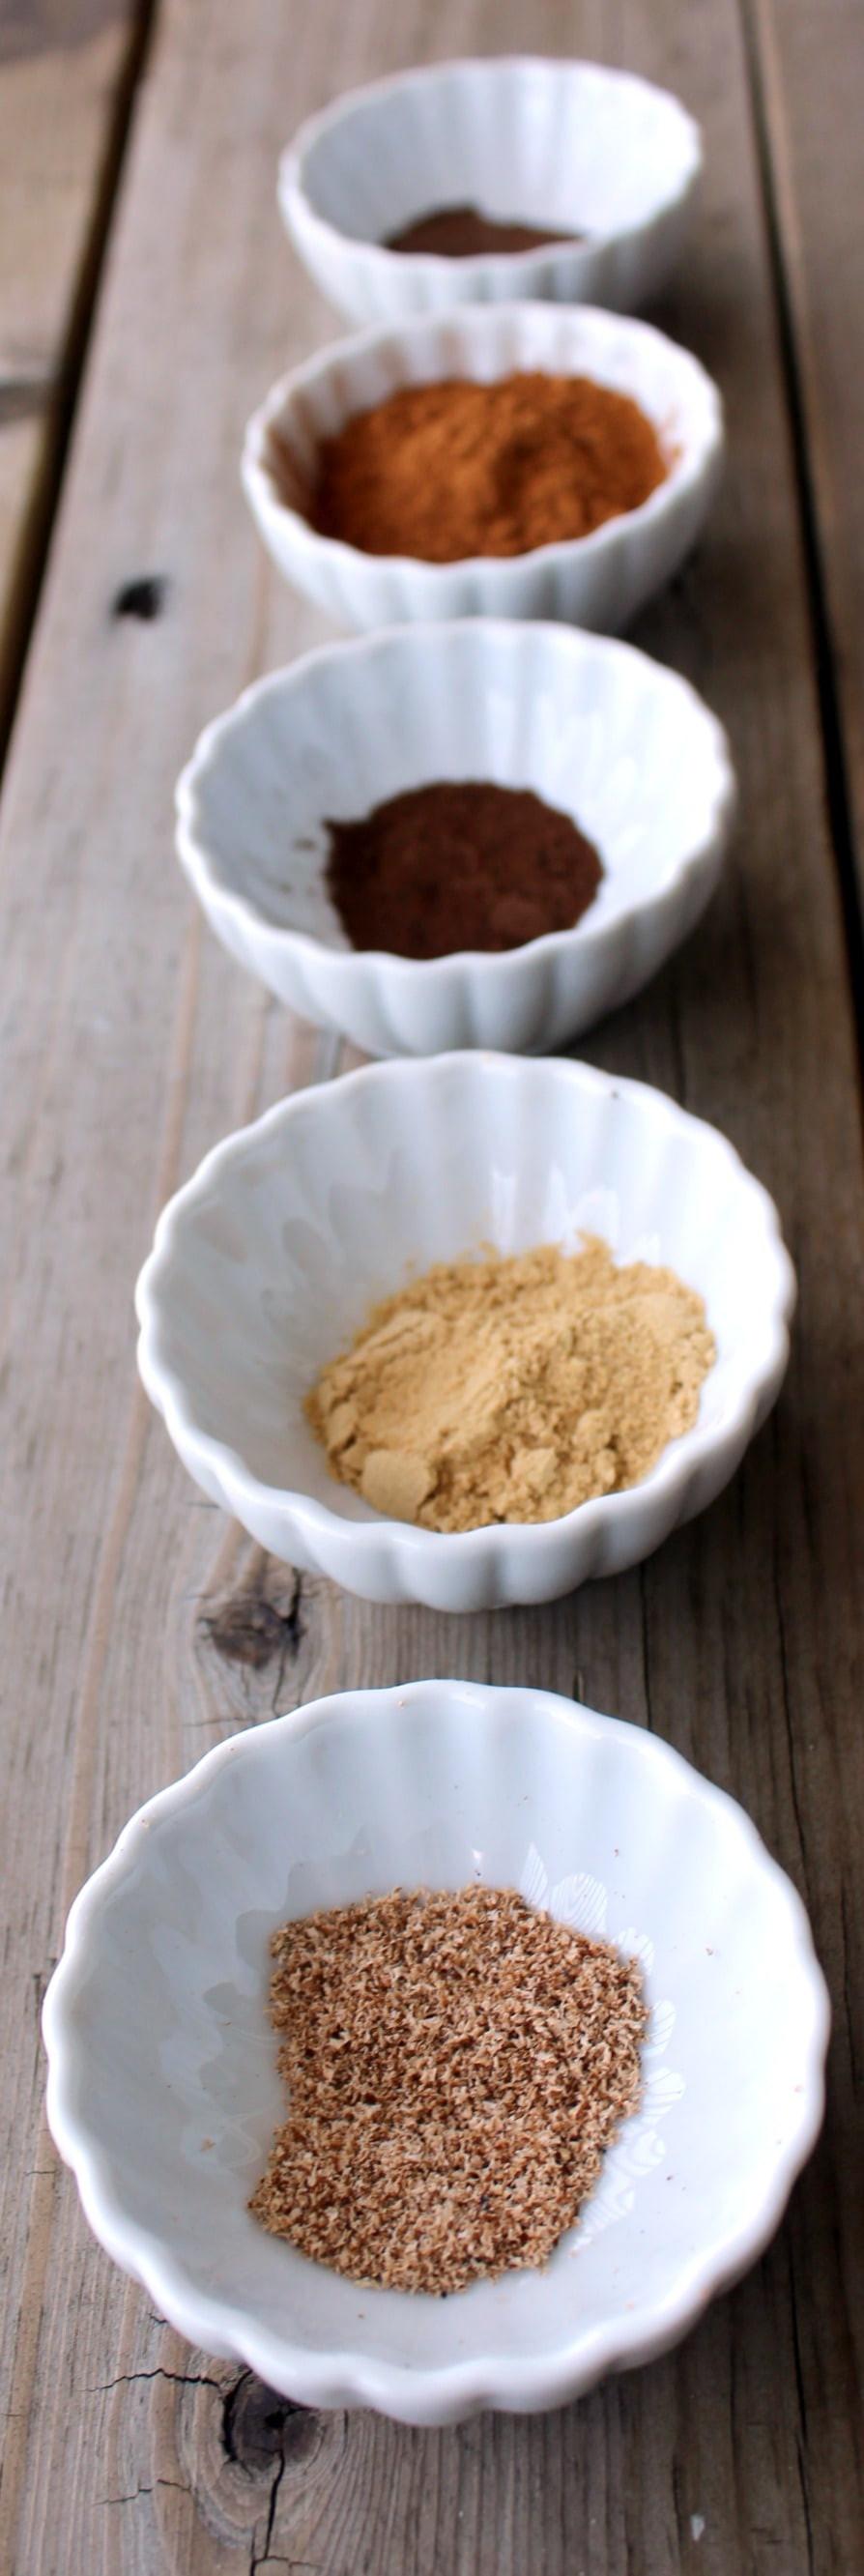 Diy Pumpkin Pie Spice  Homemade Pumpkin Pie Spice Recipe Rachel Cooks